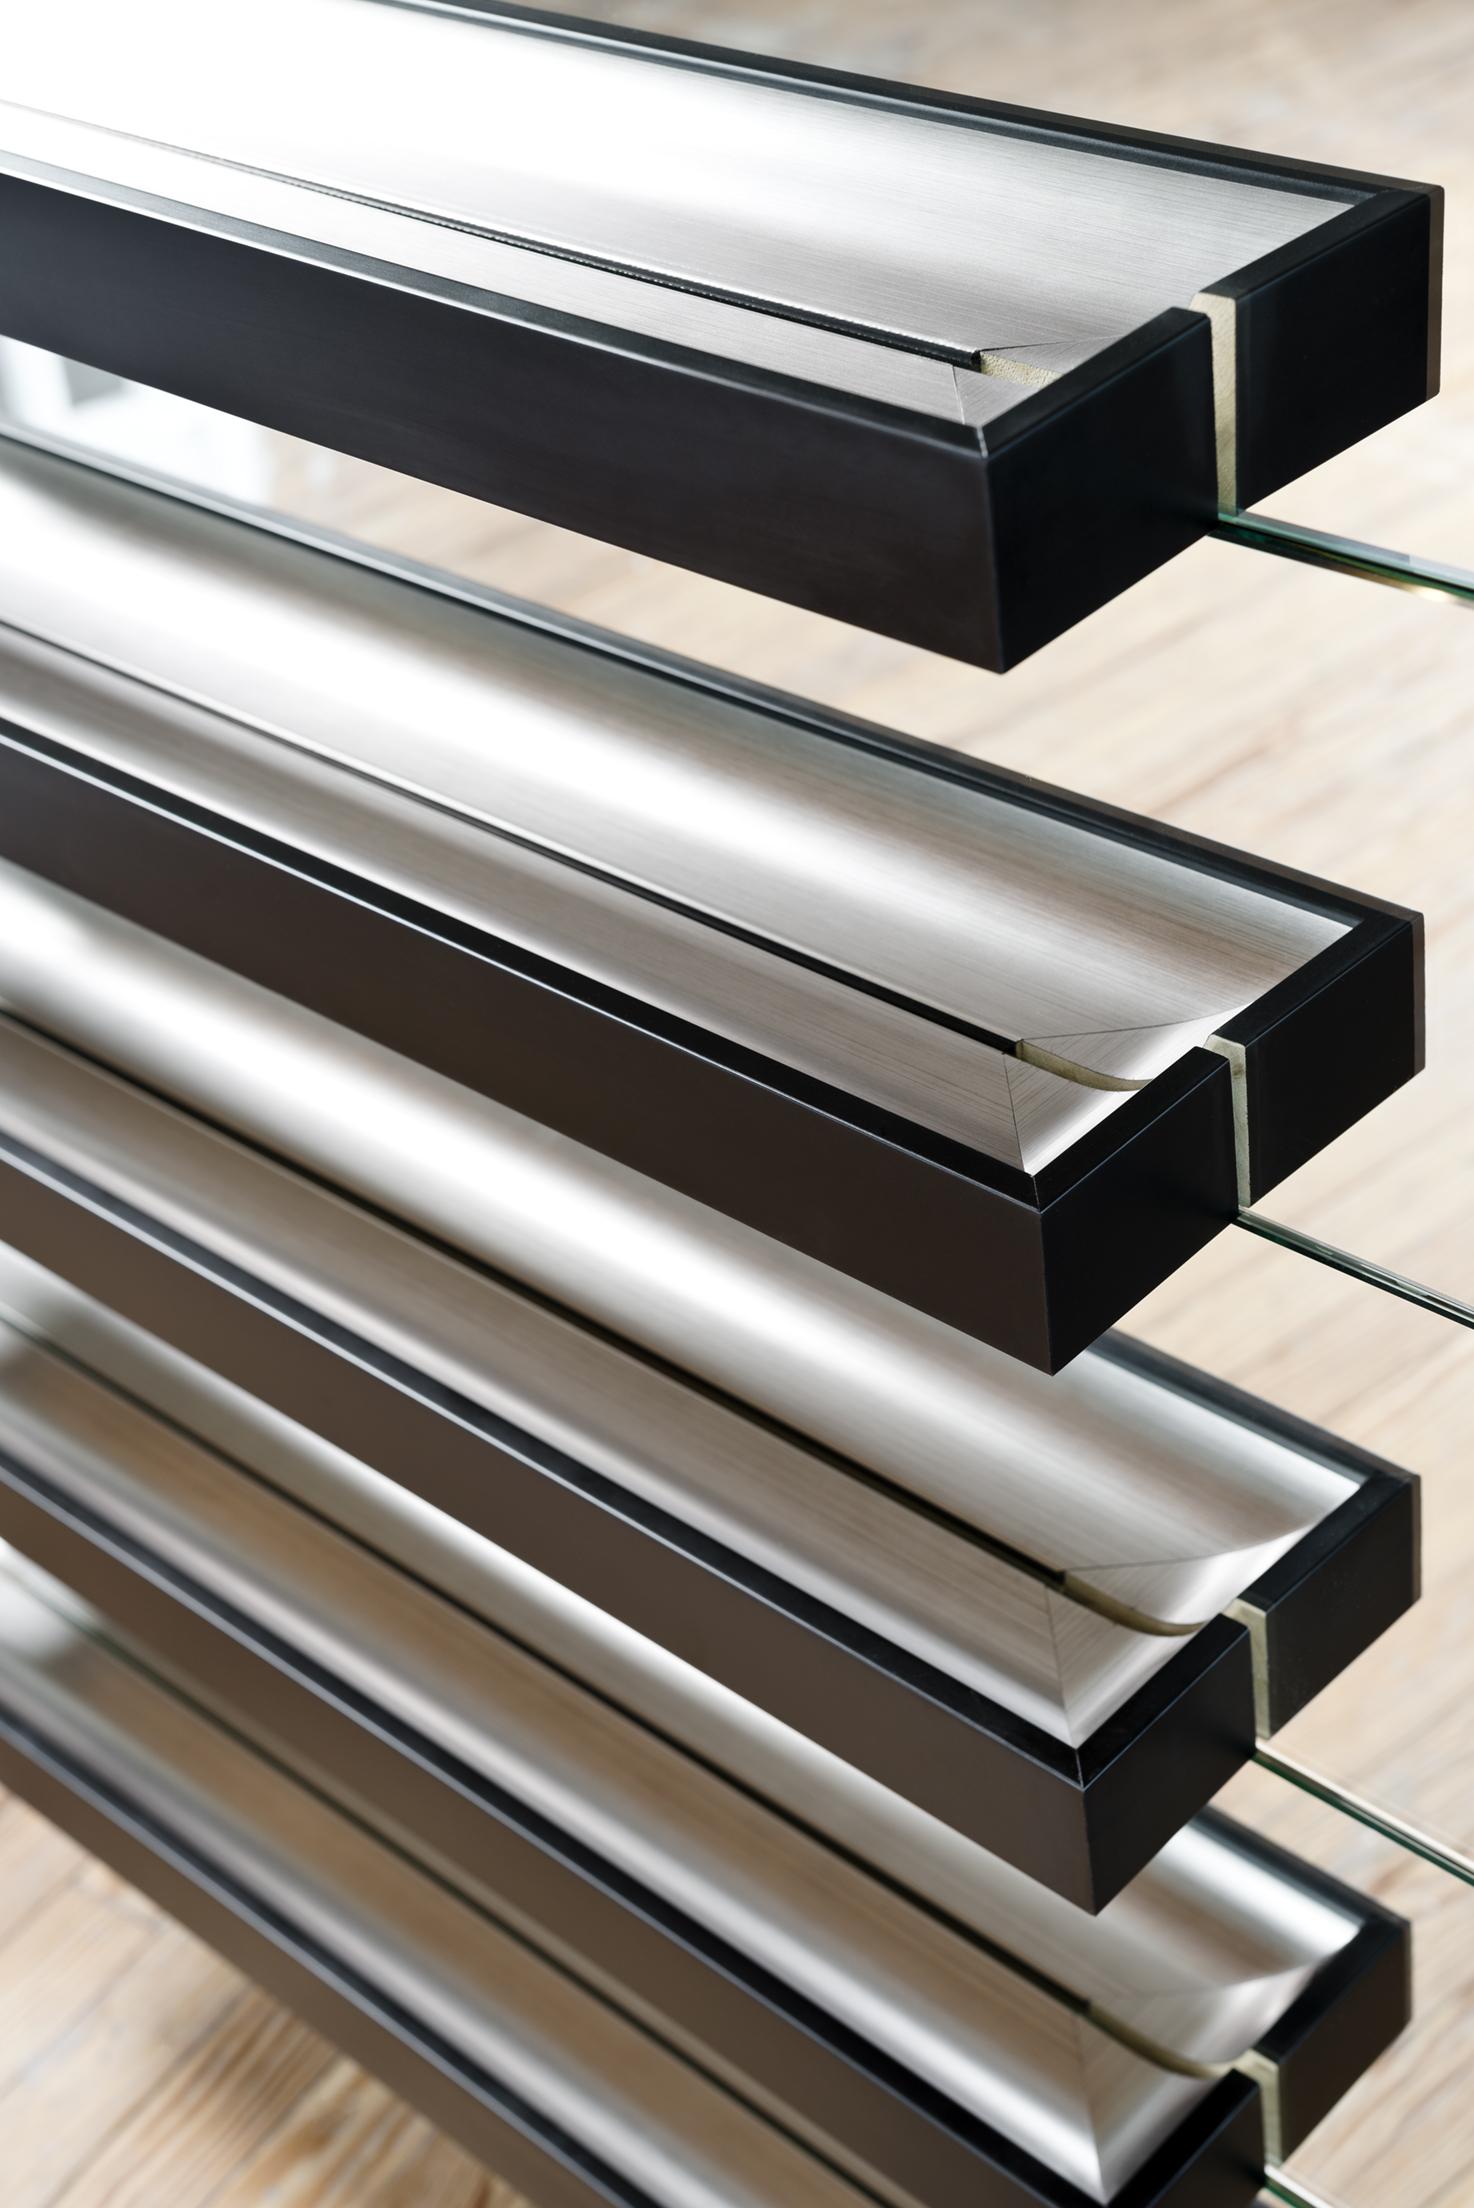 luis-pons-design-furniture-collection-mirror_4.jpg